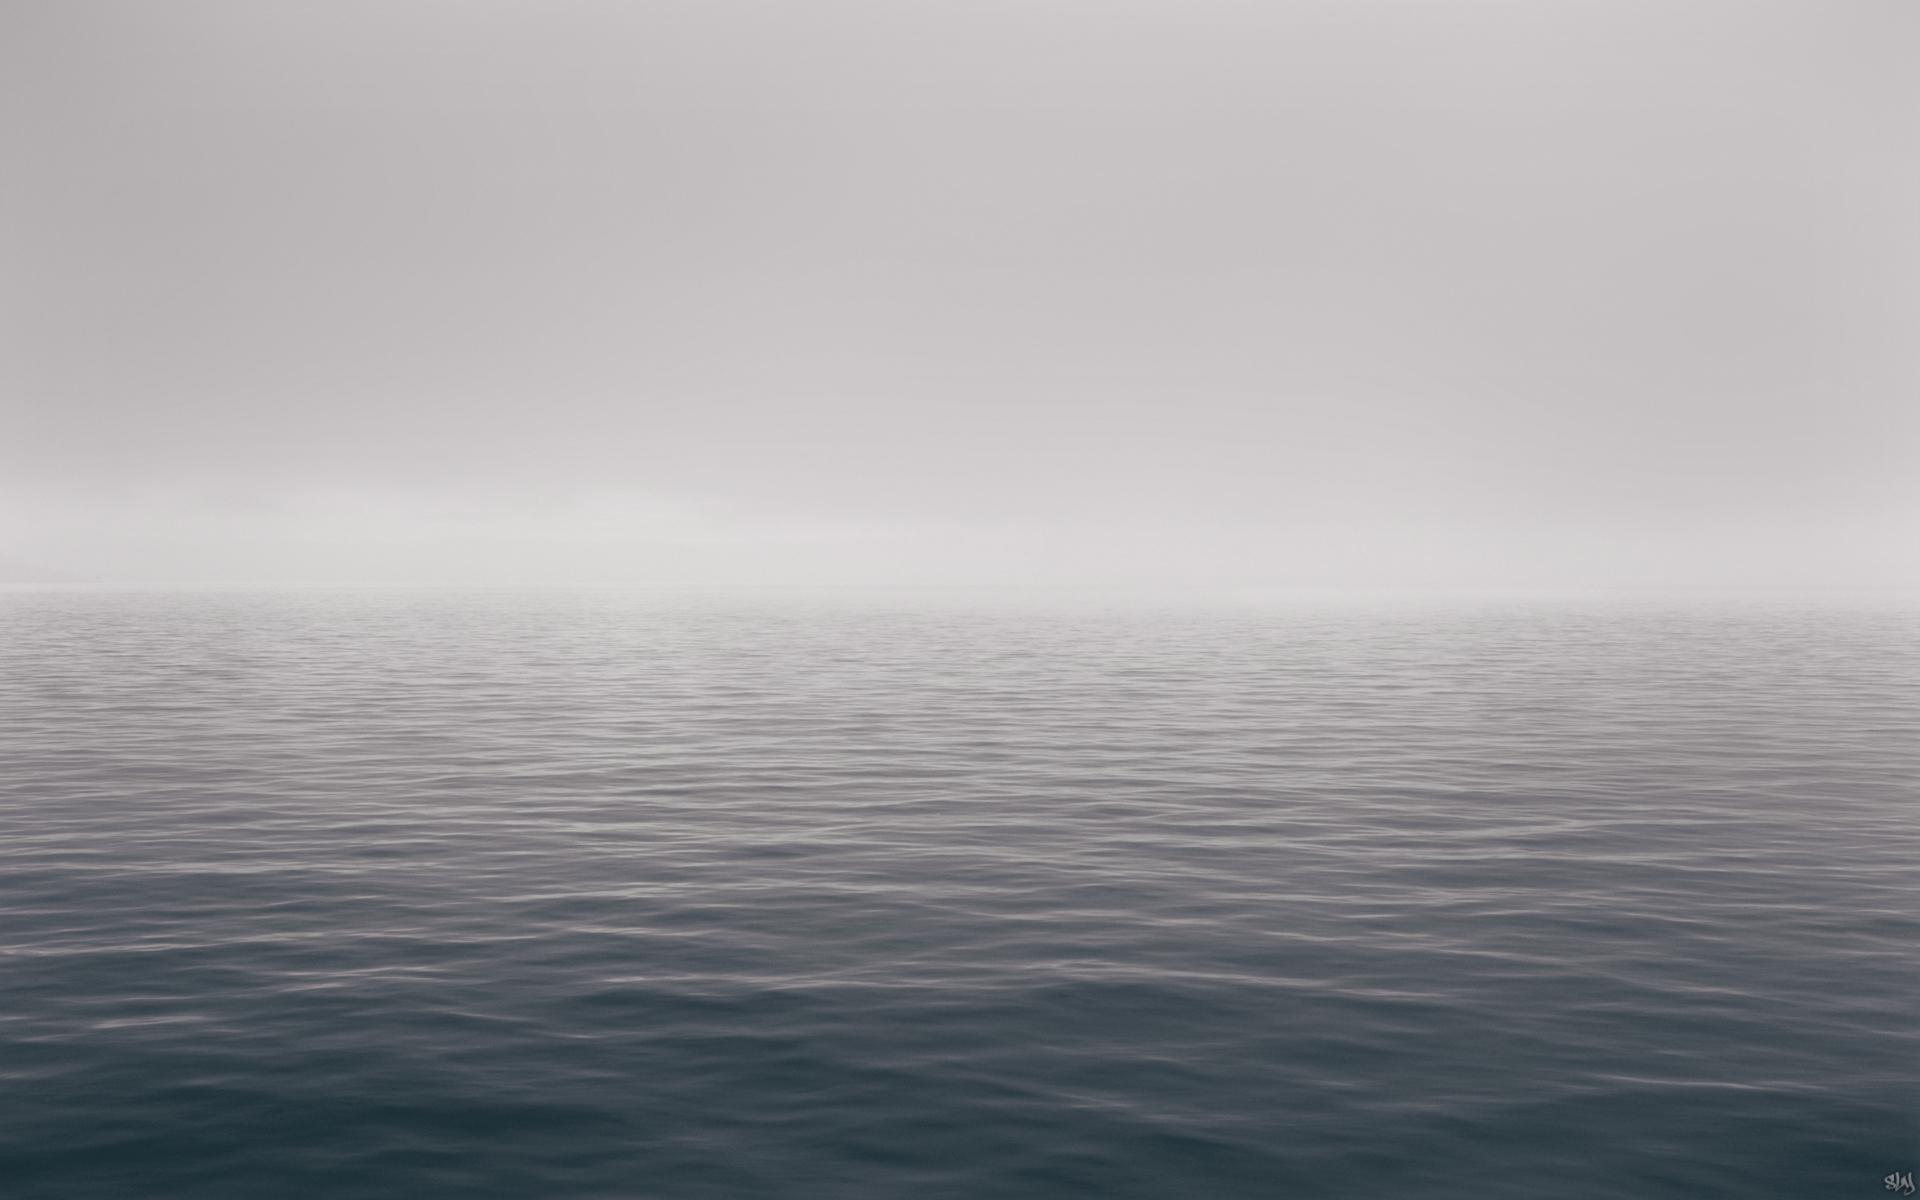 Pale ocean background tumblr